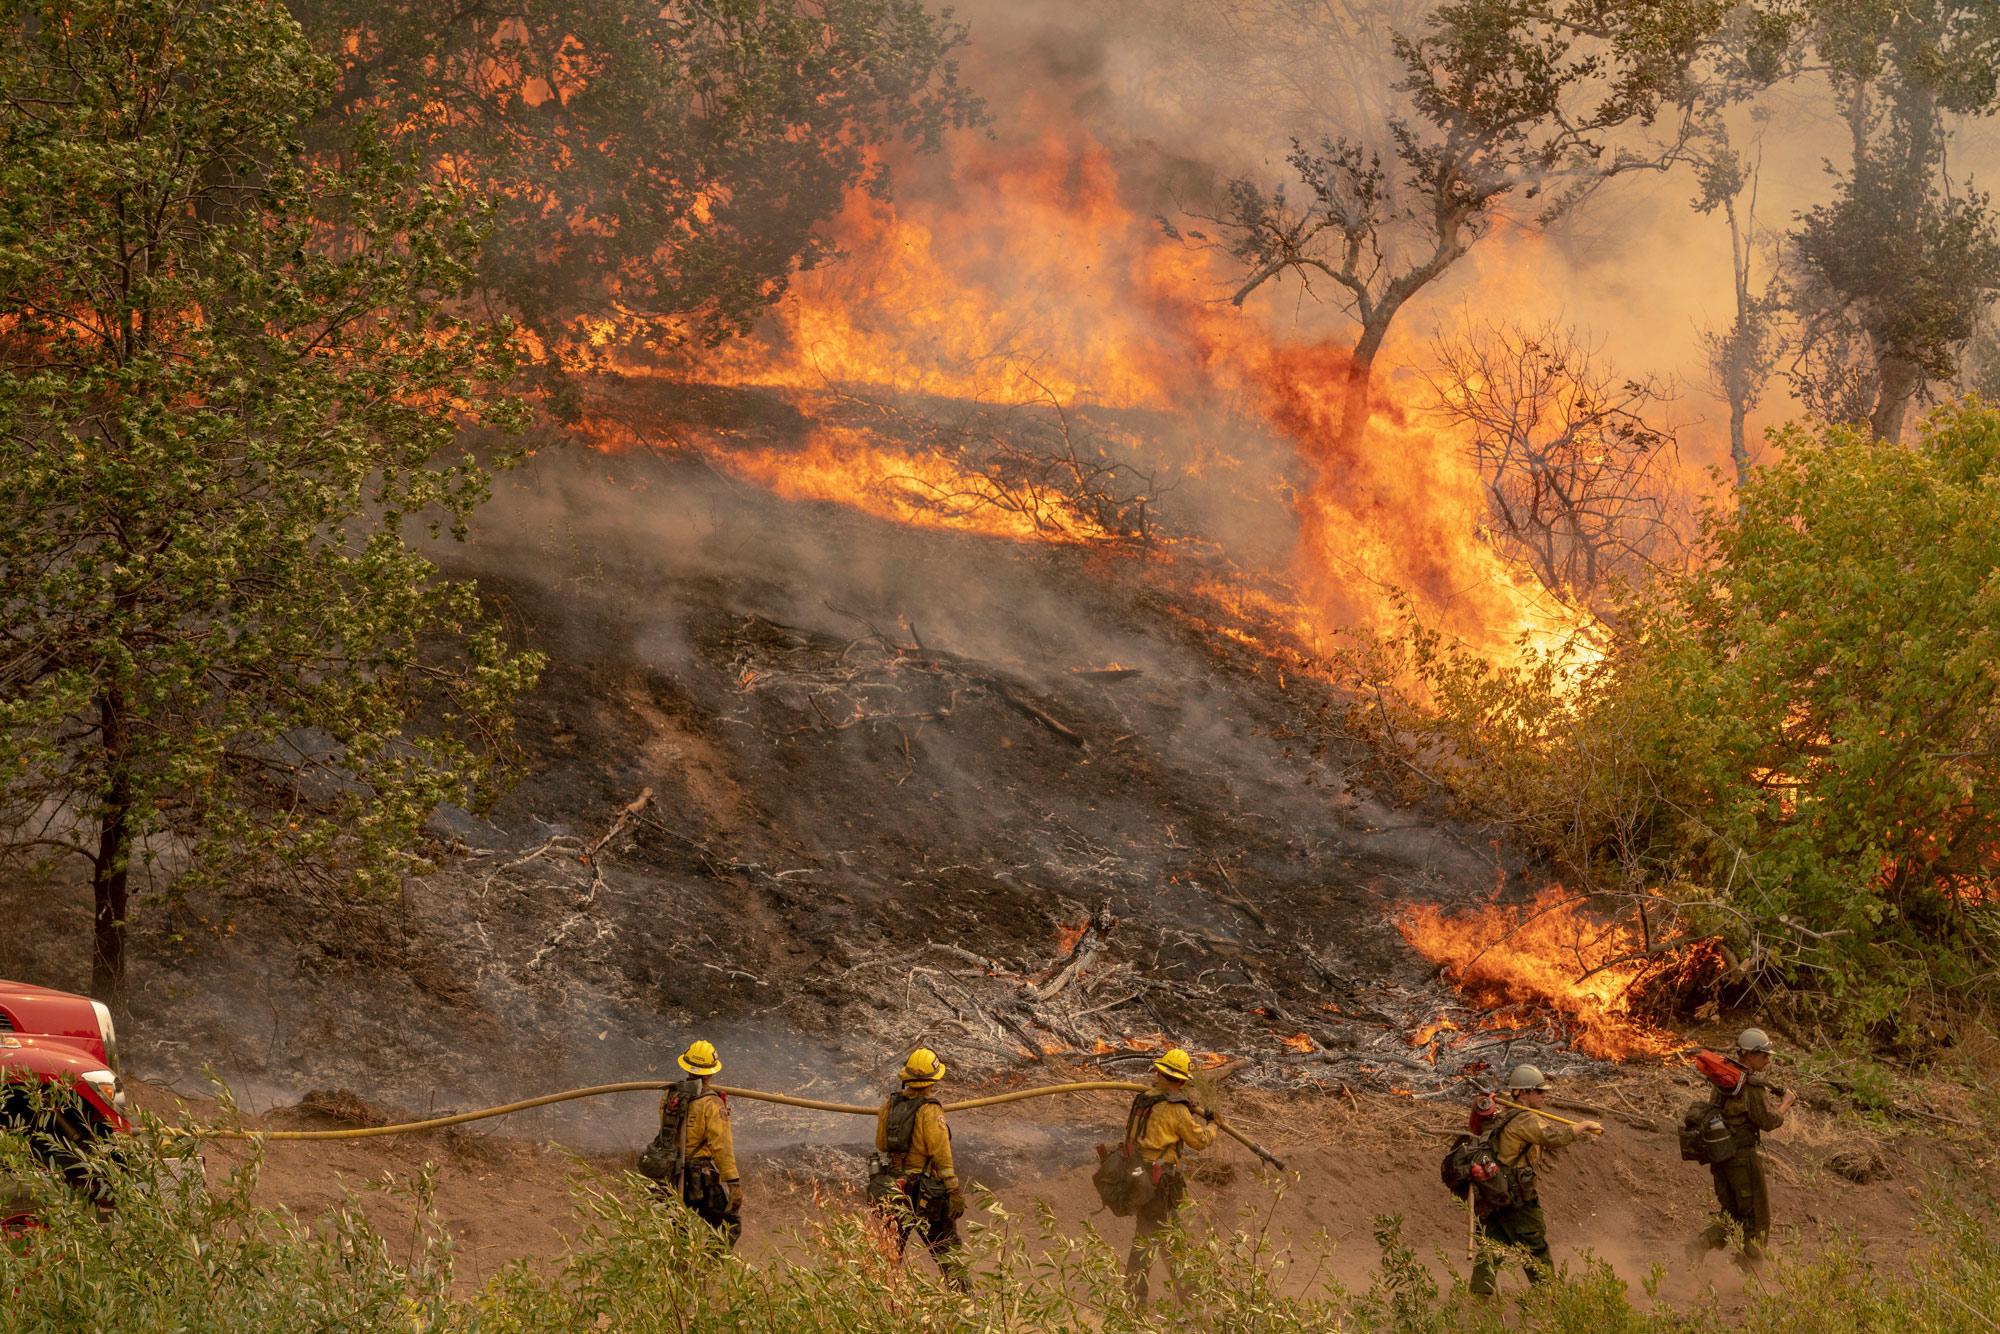 The El Dorado Fire burns a hillside near Yucaipa in the San Bernardino National Forest, California, on September 7.